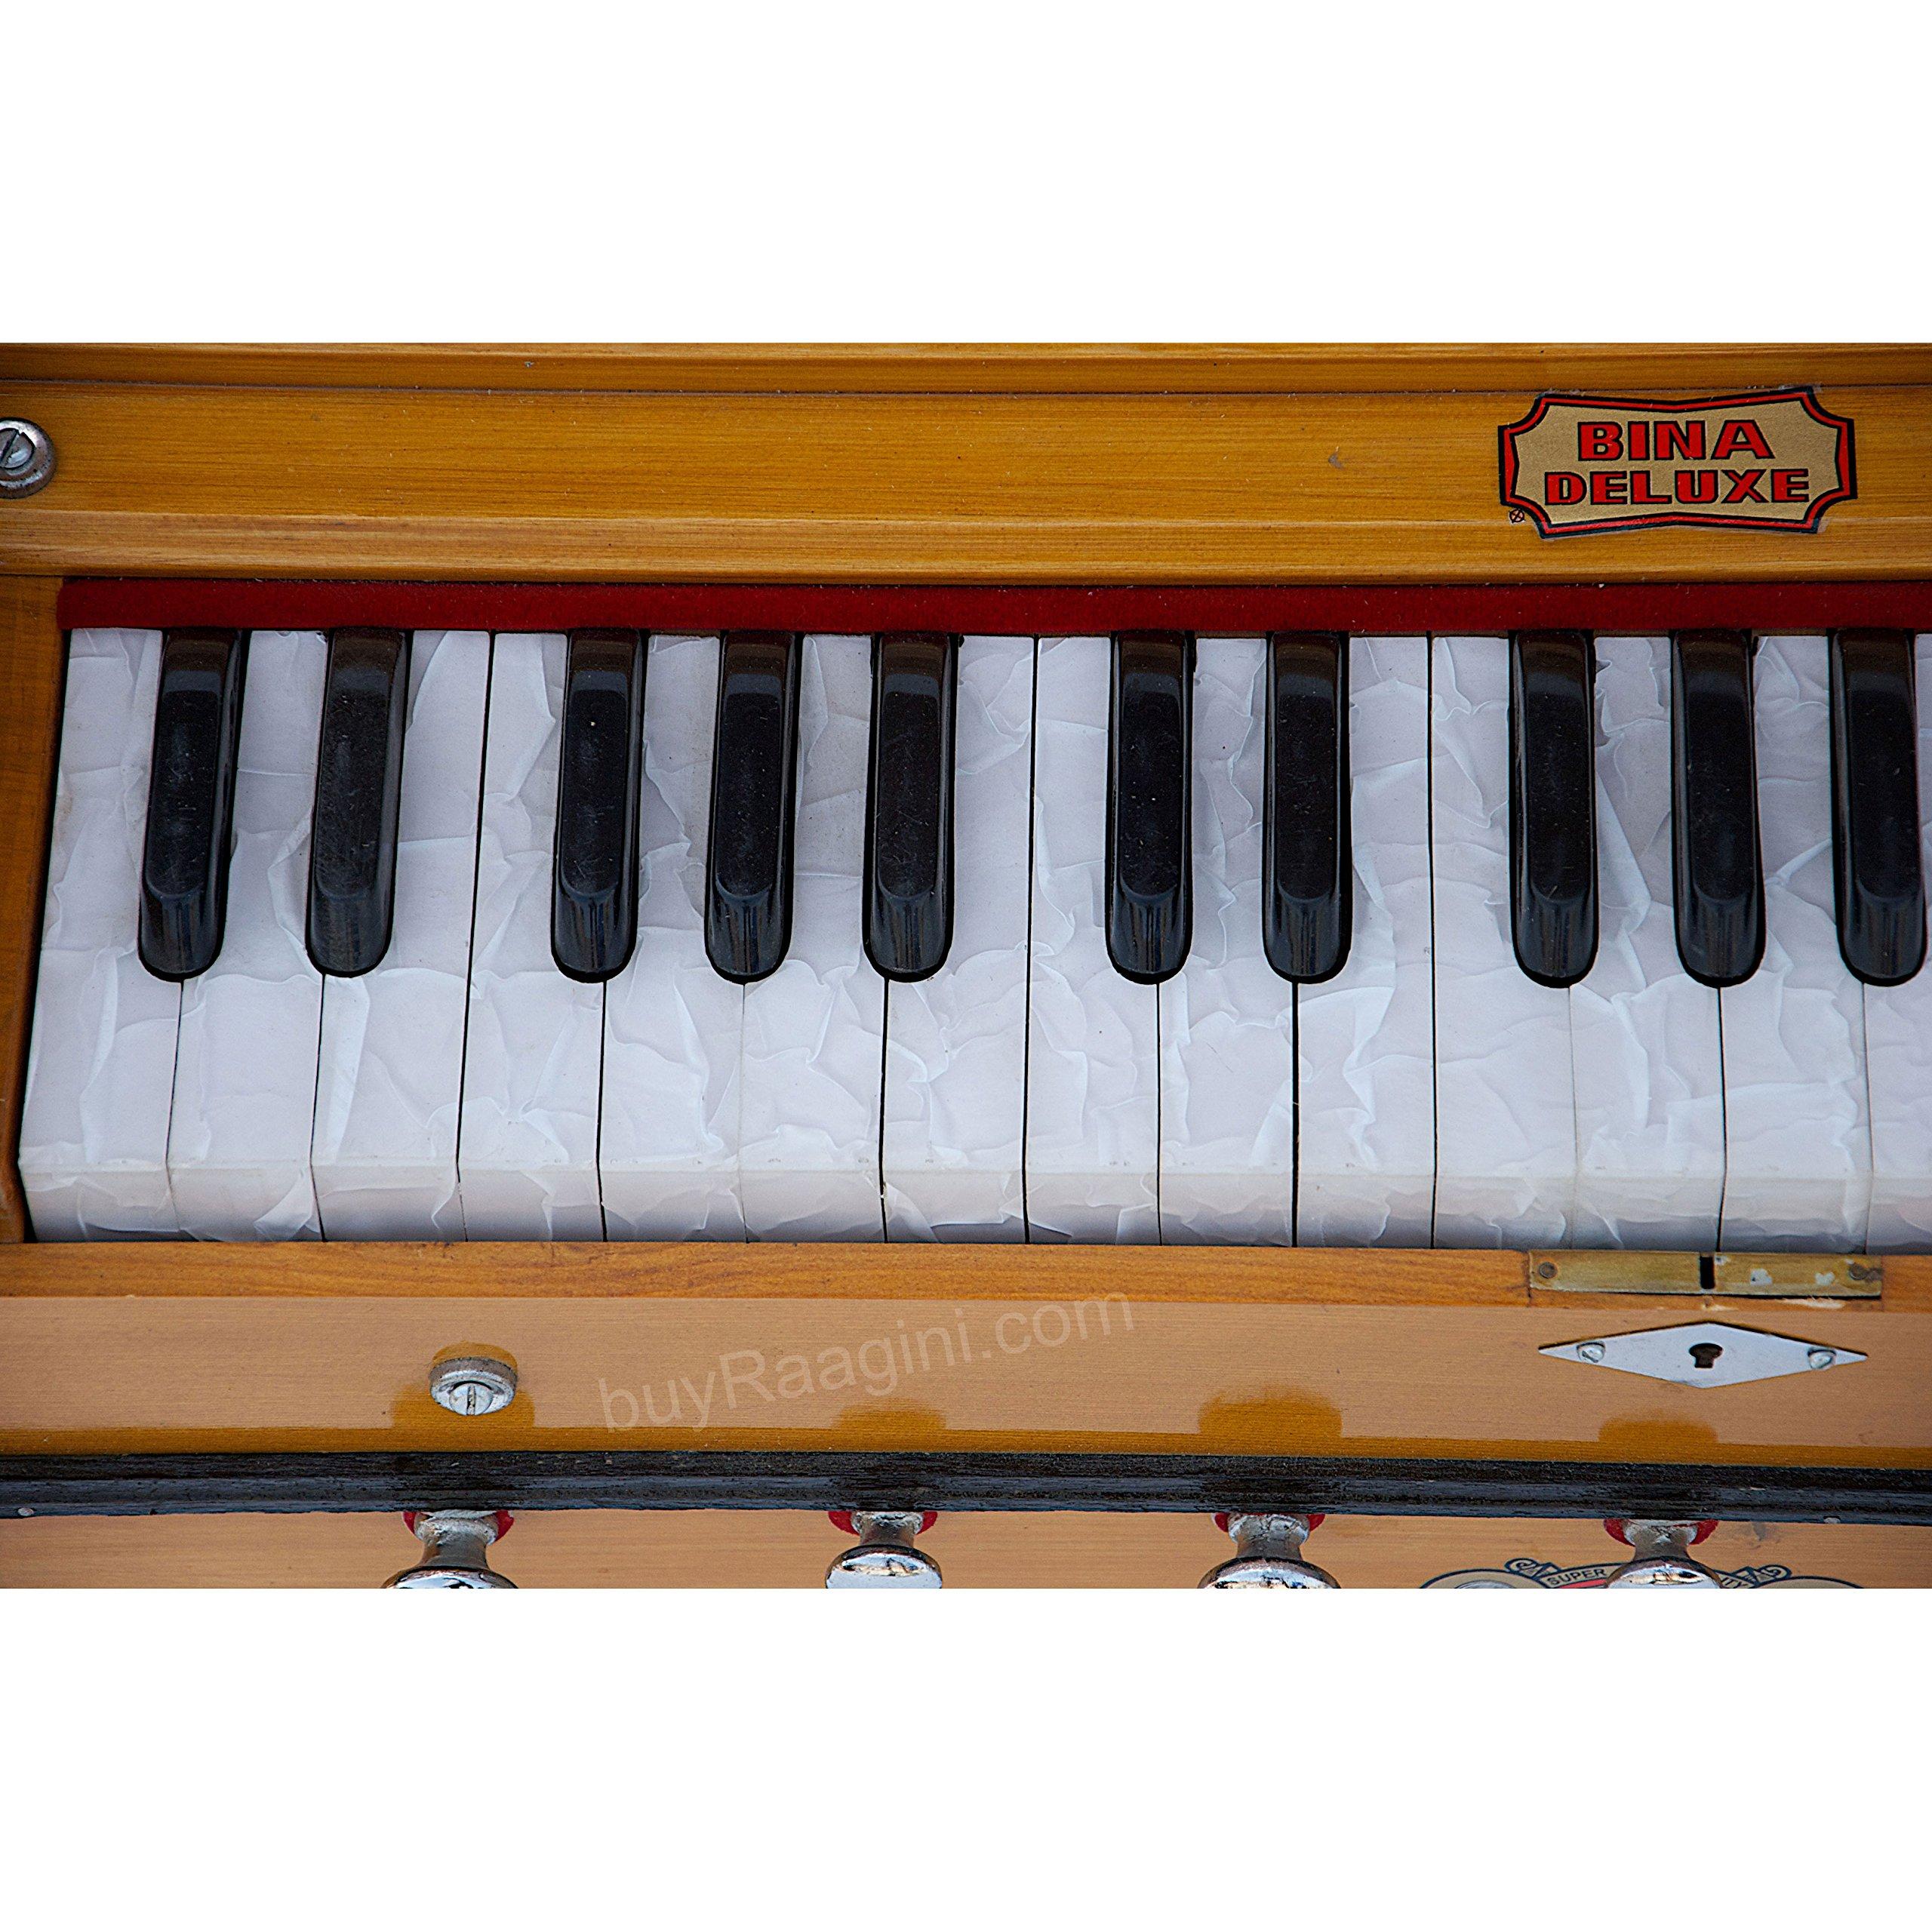 Harmonium Musical Instrument, BINA No. 8, 7 Stops, 3 1/4 Octaves, Coupler, Tuned To A400, Double Reed, Natural Color, Book, Nylon Bag (PDI-DJF) by Bina (Image #6)